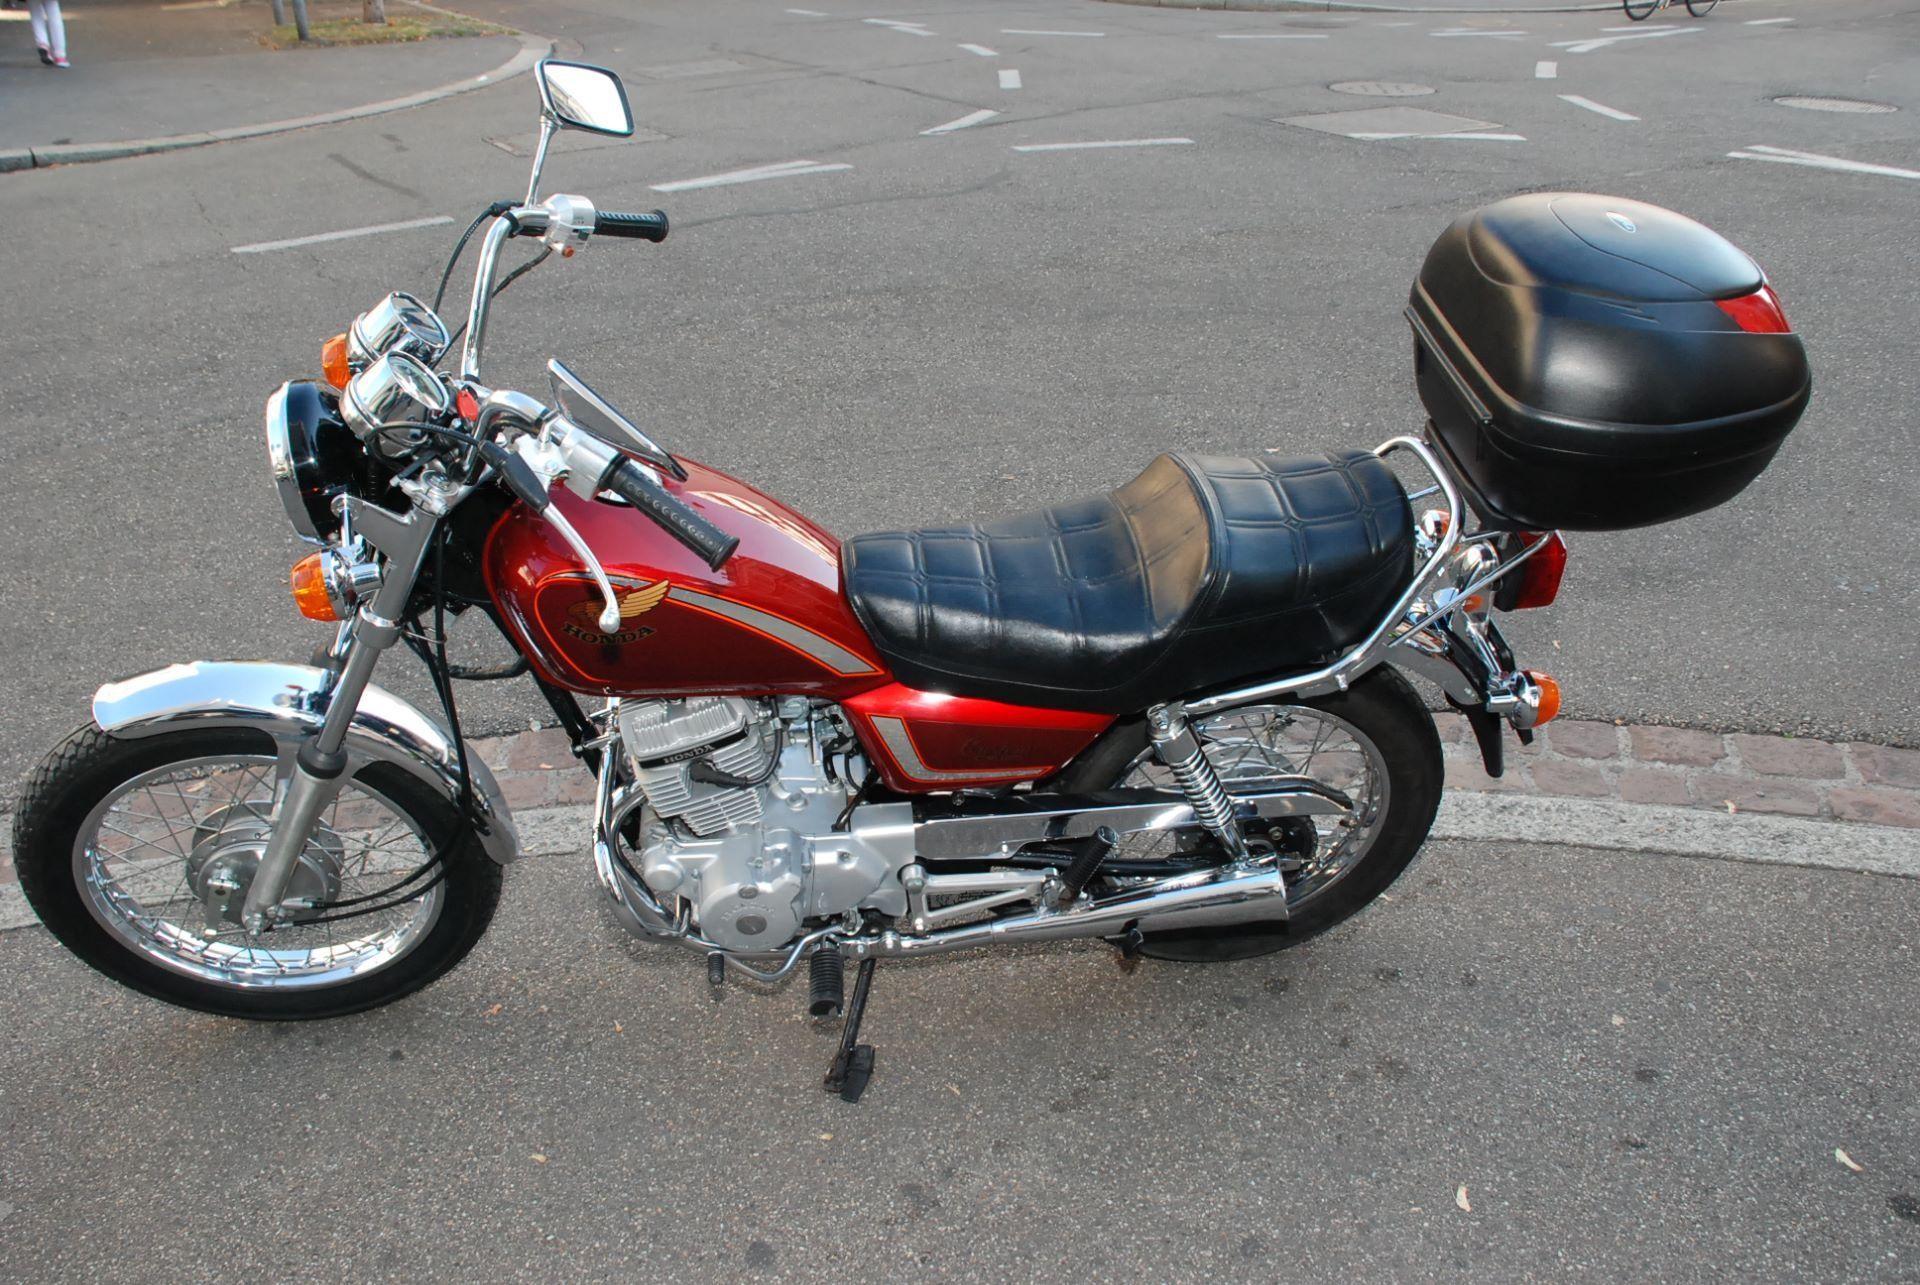 moto occasions acheter honda cm 125 c motofloh gmbh basel. Black Bedroom Furniture Sets. Home Design Ideas